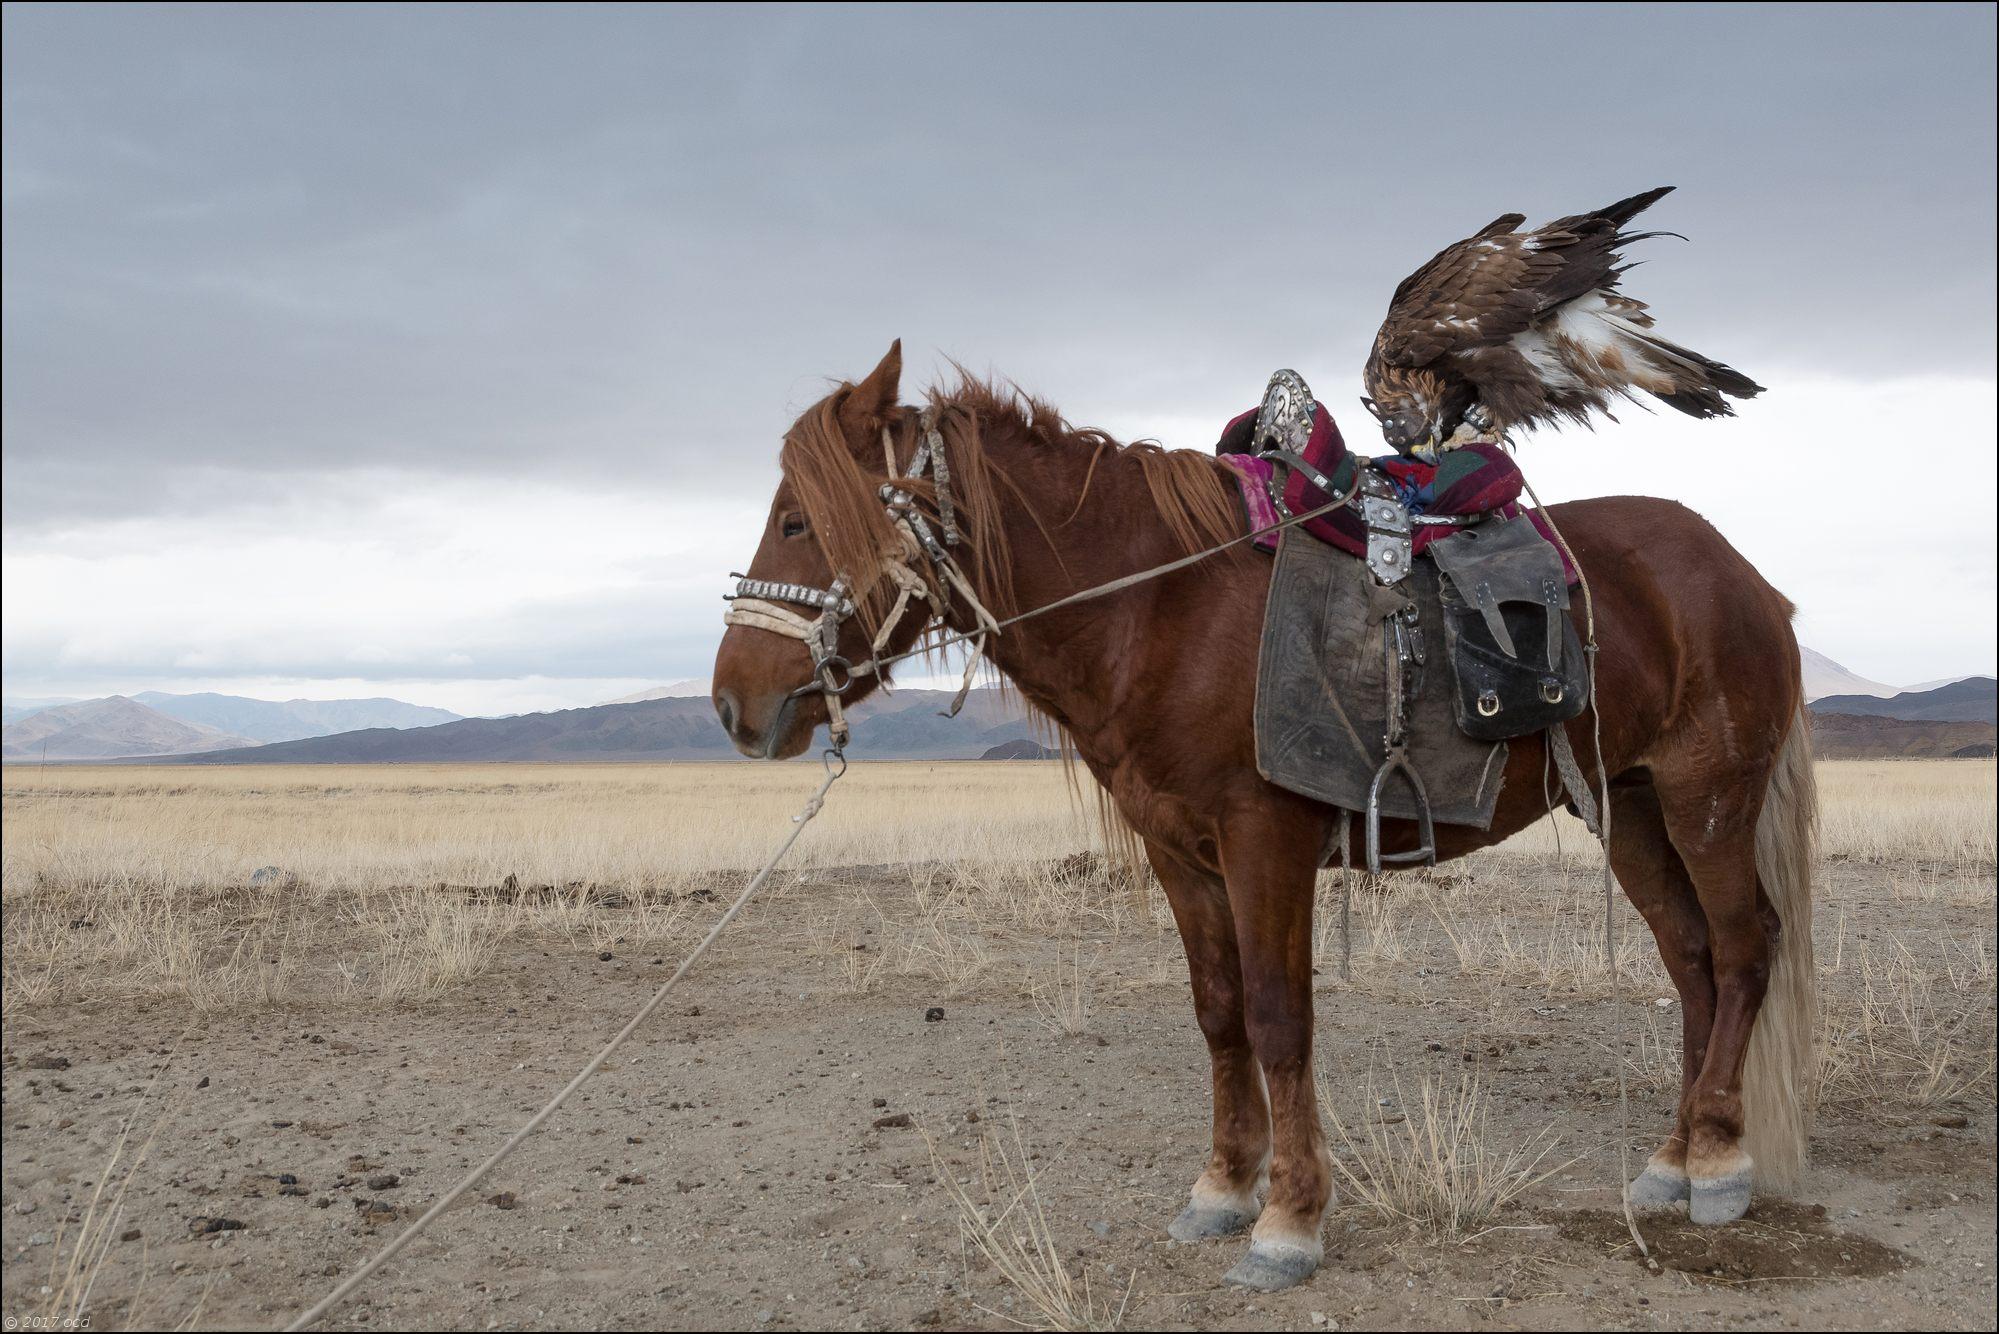 Mongolie-2017- aigle-cheval